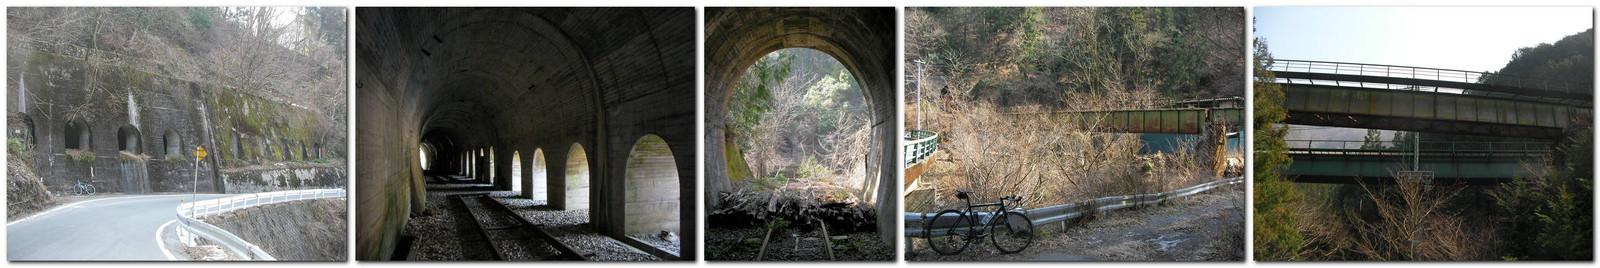 2014年3月12日「国道418号線沿いの飯田線旧線」